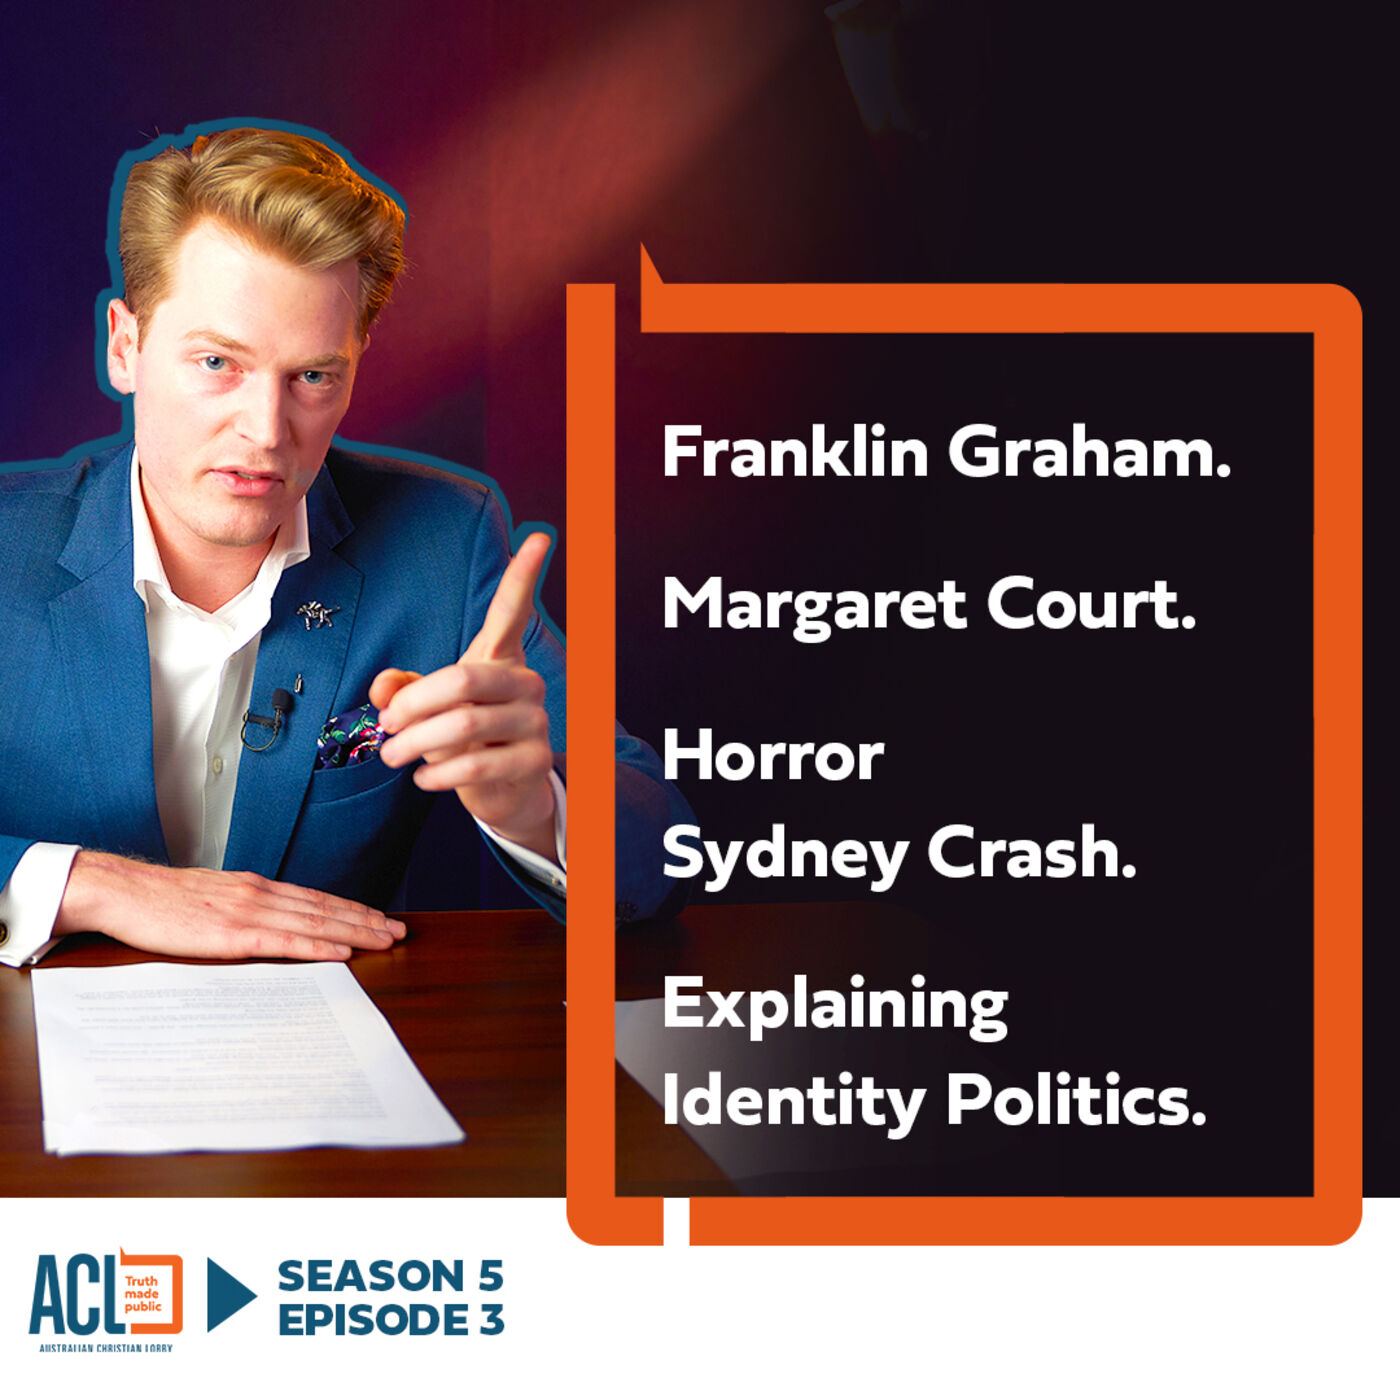 SEASON 5 - EP#503 | Franklin Graham | Margaret Court | Horror Sydney Crash | Your Questions